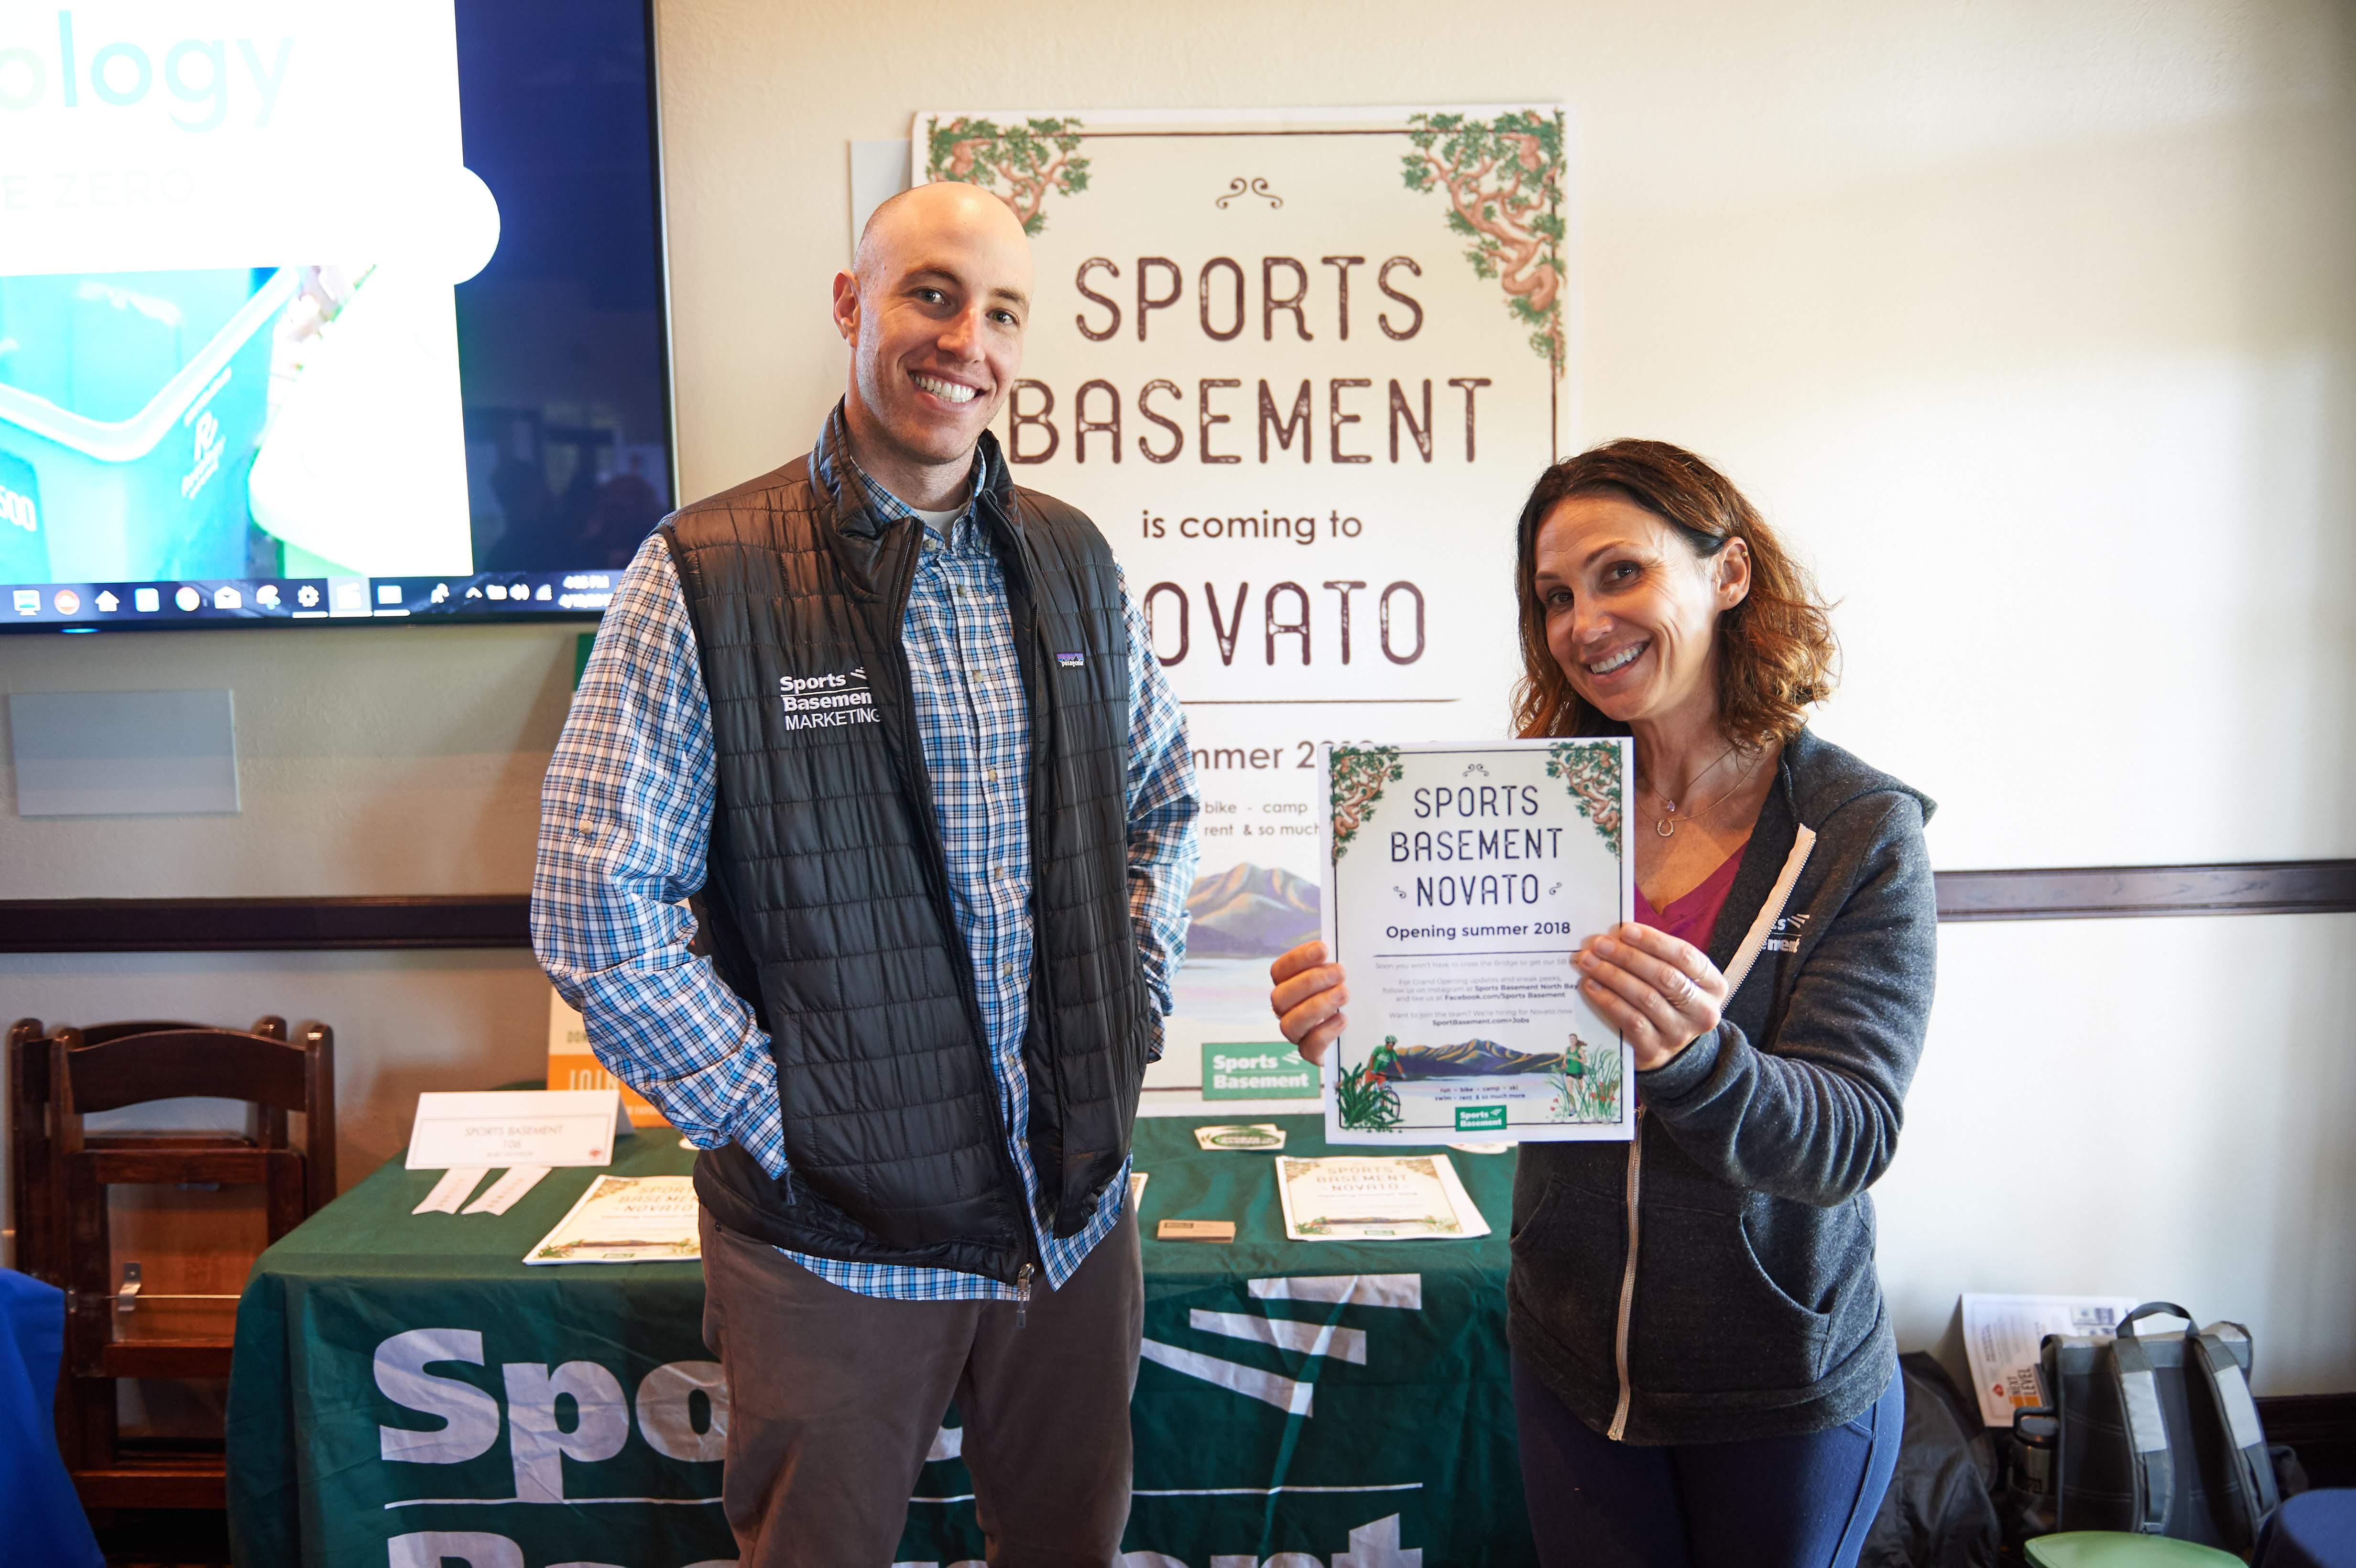 Sports Baeement North Bay BUsiness Expo Tradesho Showcase San Rafael Novato Chamber